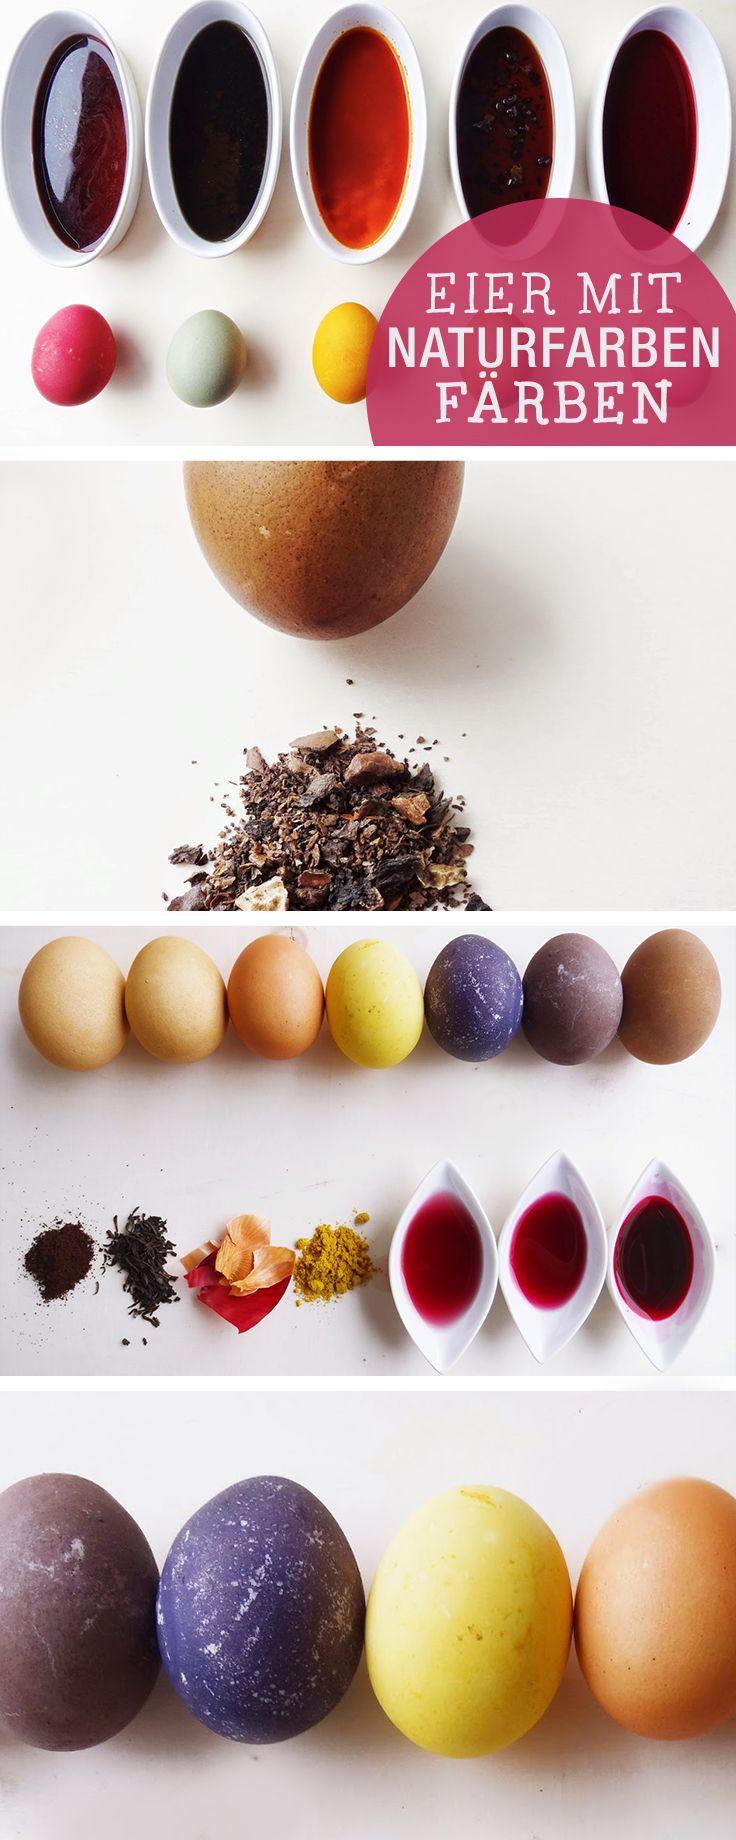 DIY-Anleitung: Ostereier mit Naturfarben färben / diy tutorial: how to colour easter eggs with natural colours via DaWanda.com